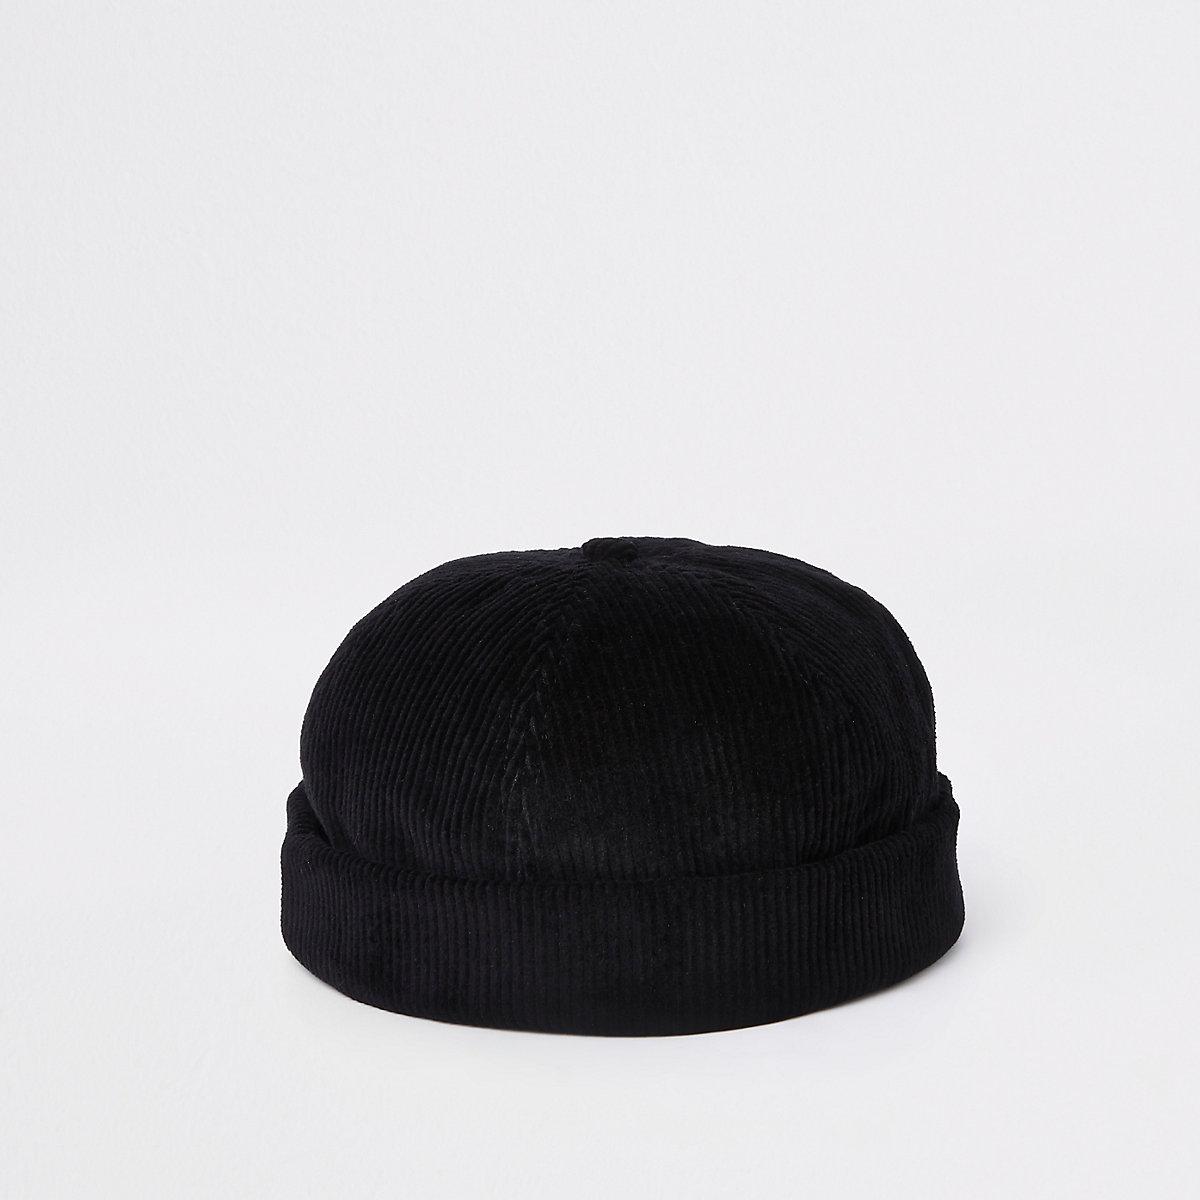 Bonnet en velours côtelé noir style docker